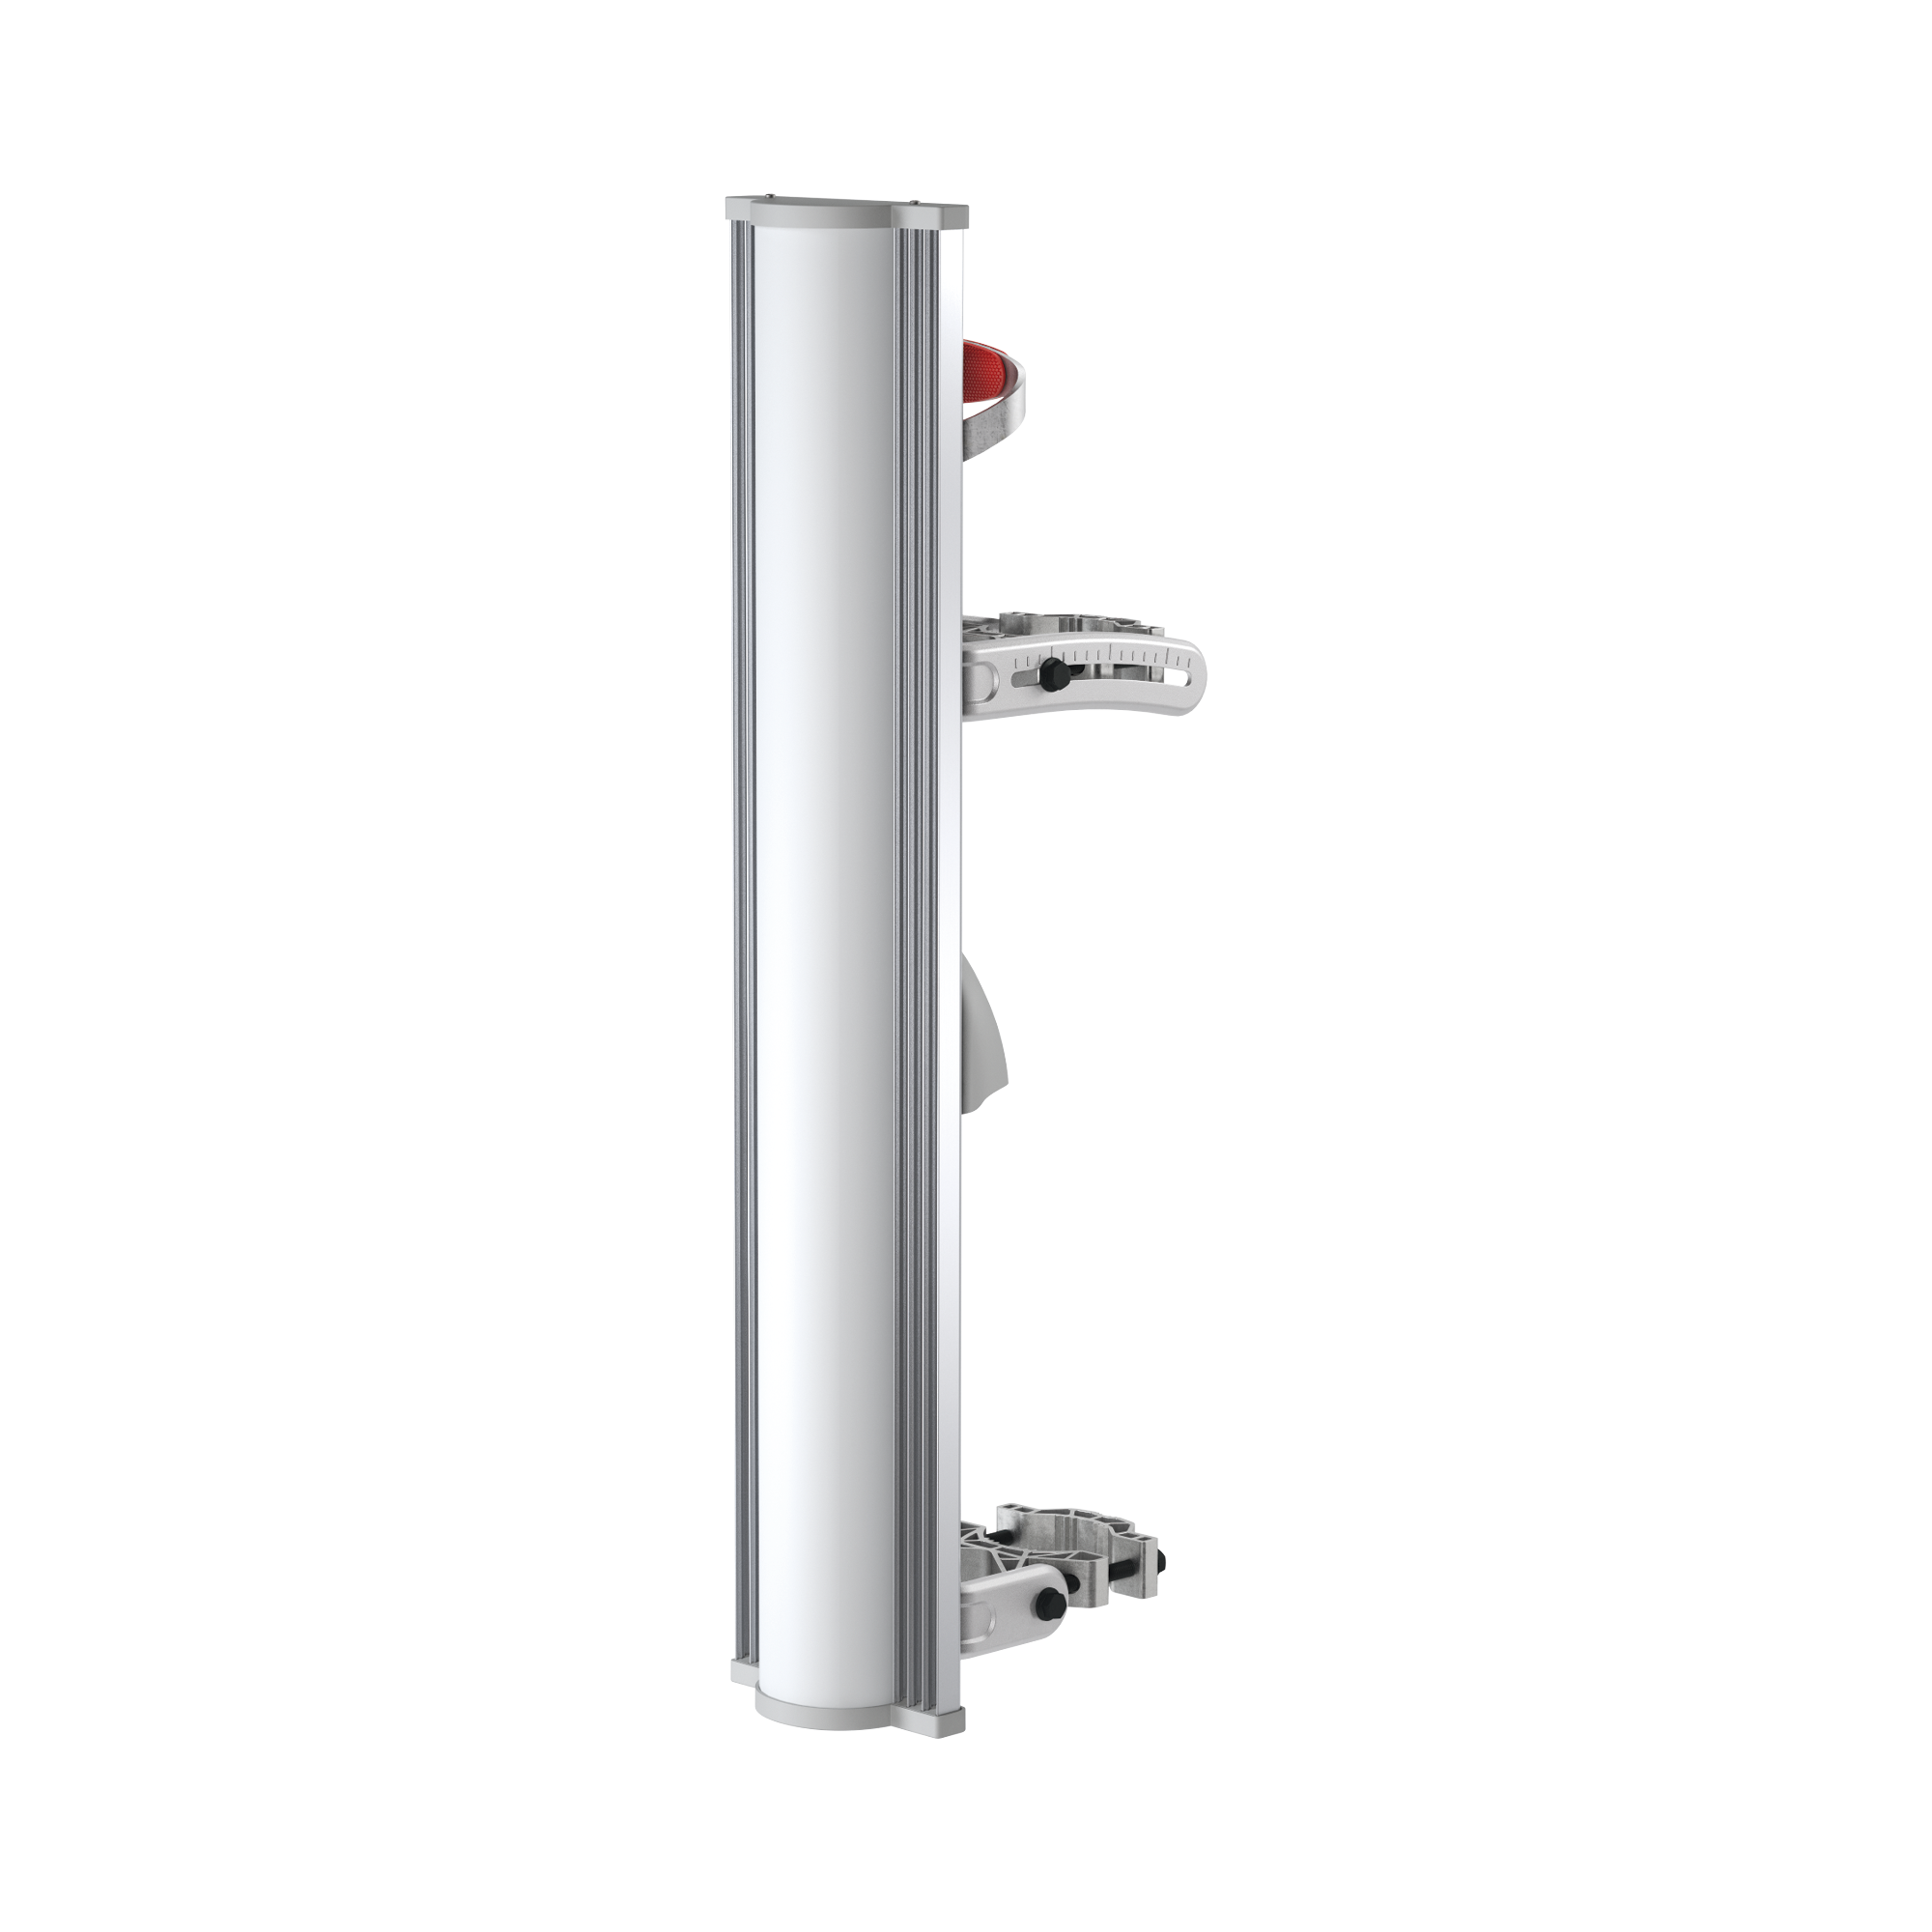 Antena sectorial de 100 grados, 20 dBi, 5150-5850 MHz , desempeño Carrier Class, integra BackShield para evitar lóbulos laterales